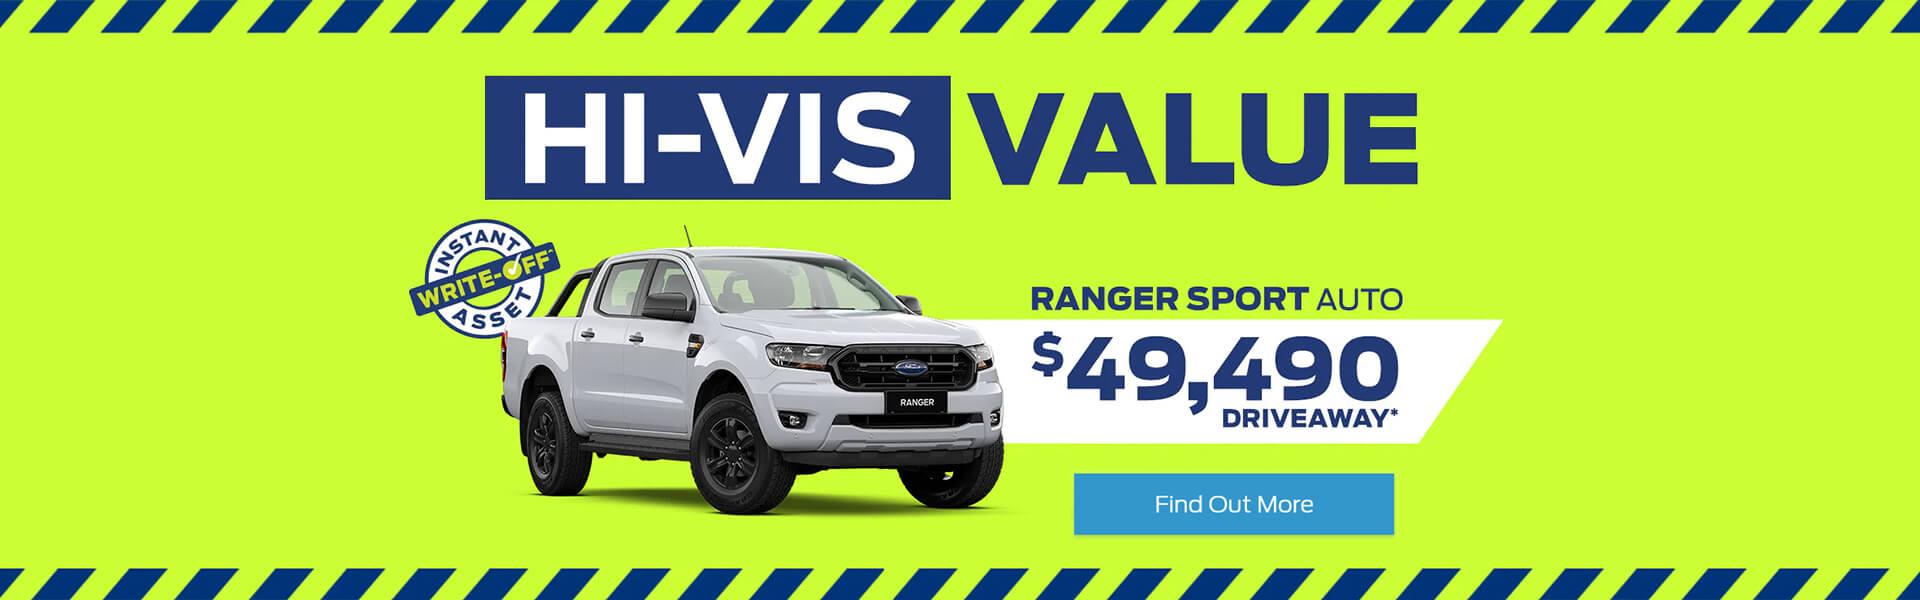 Hi-Vis Value Ranger Sport Auto